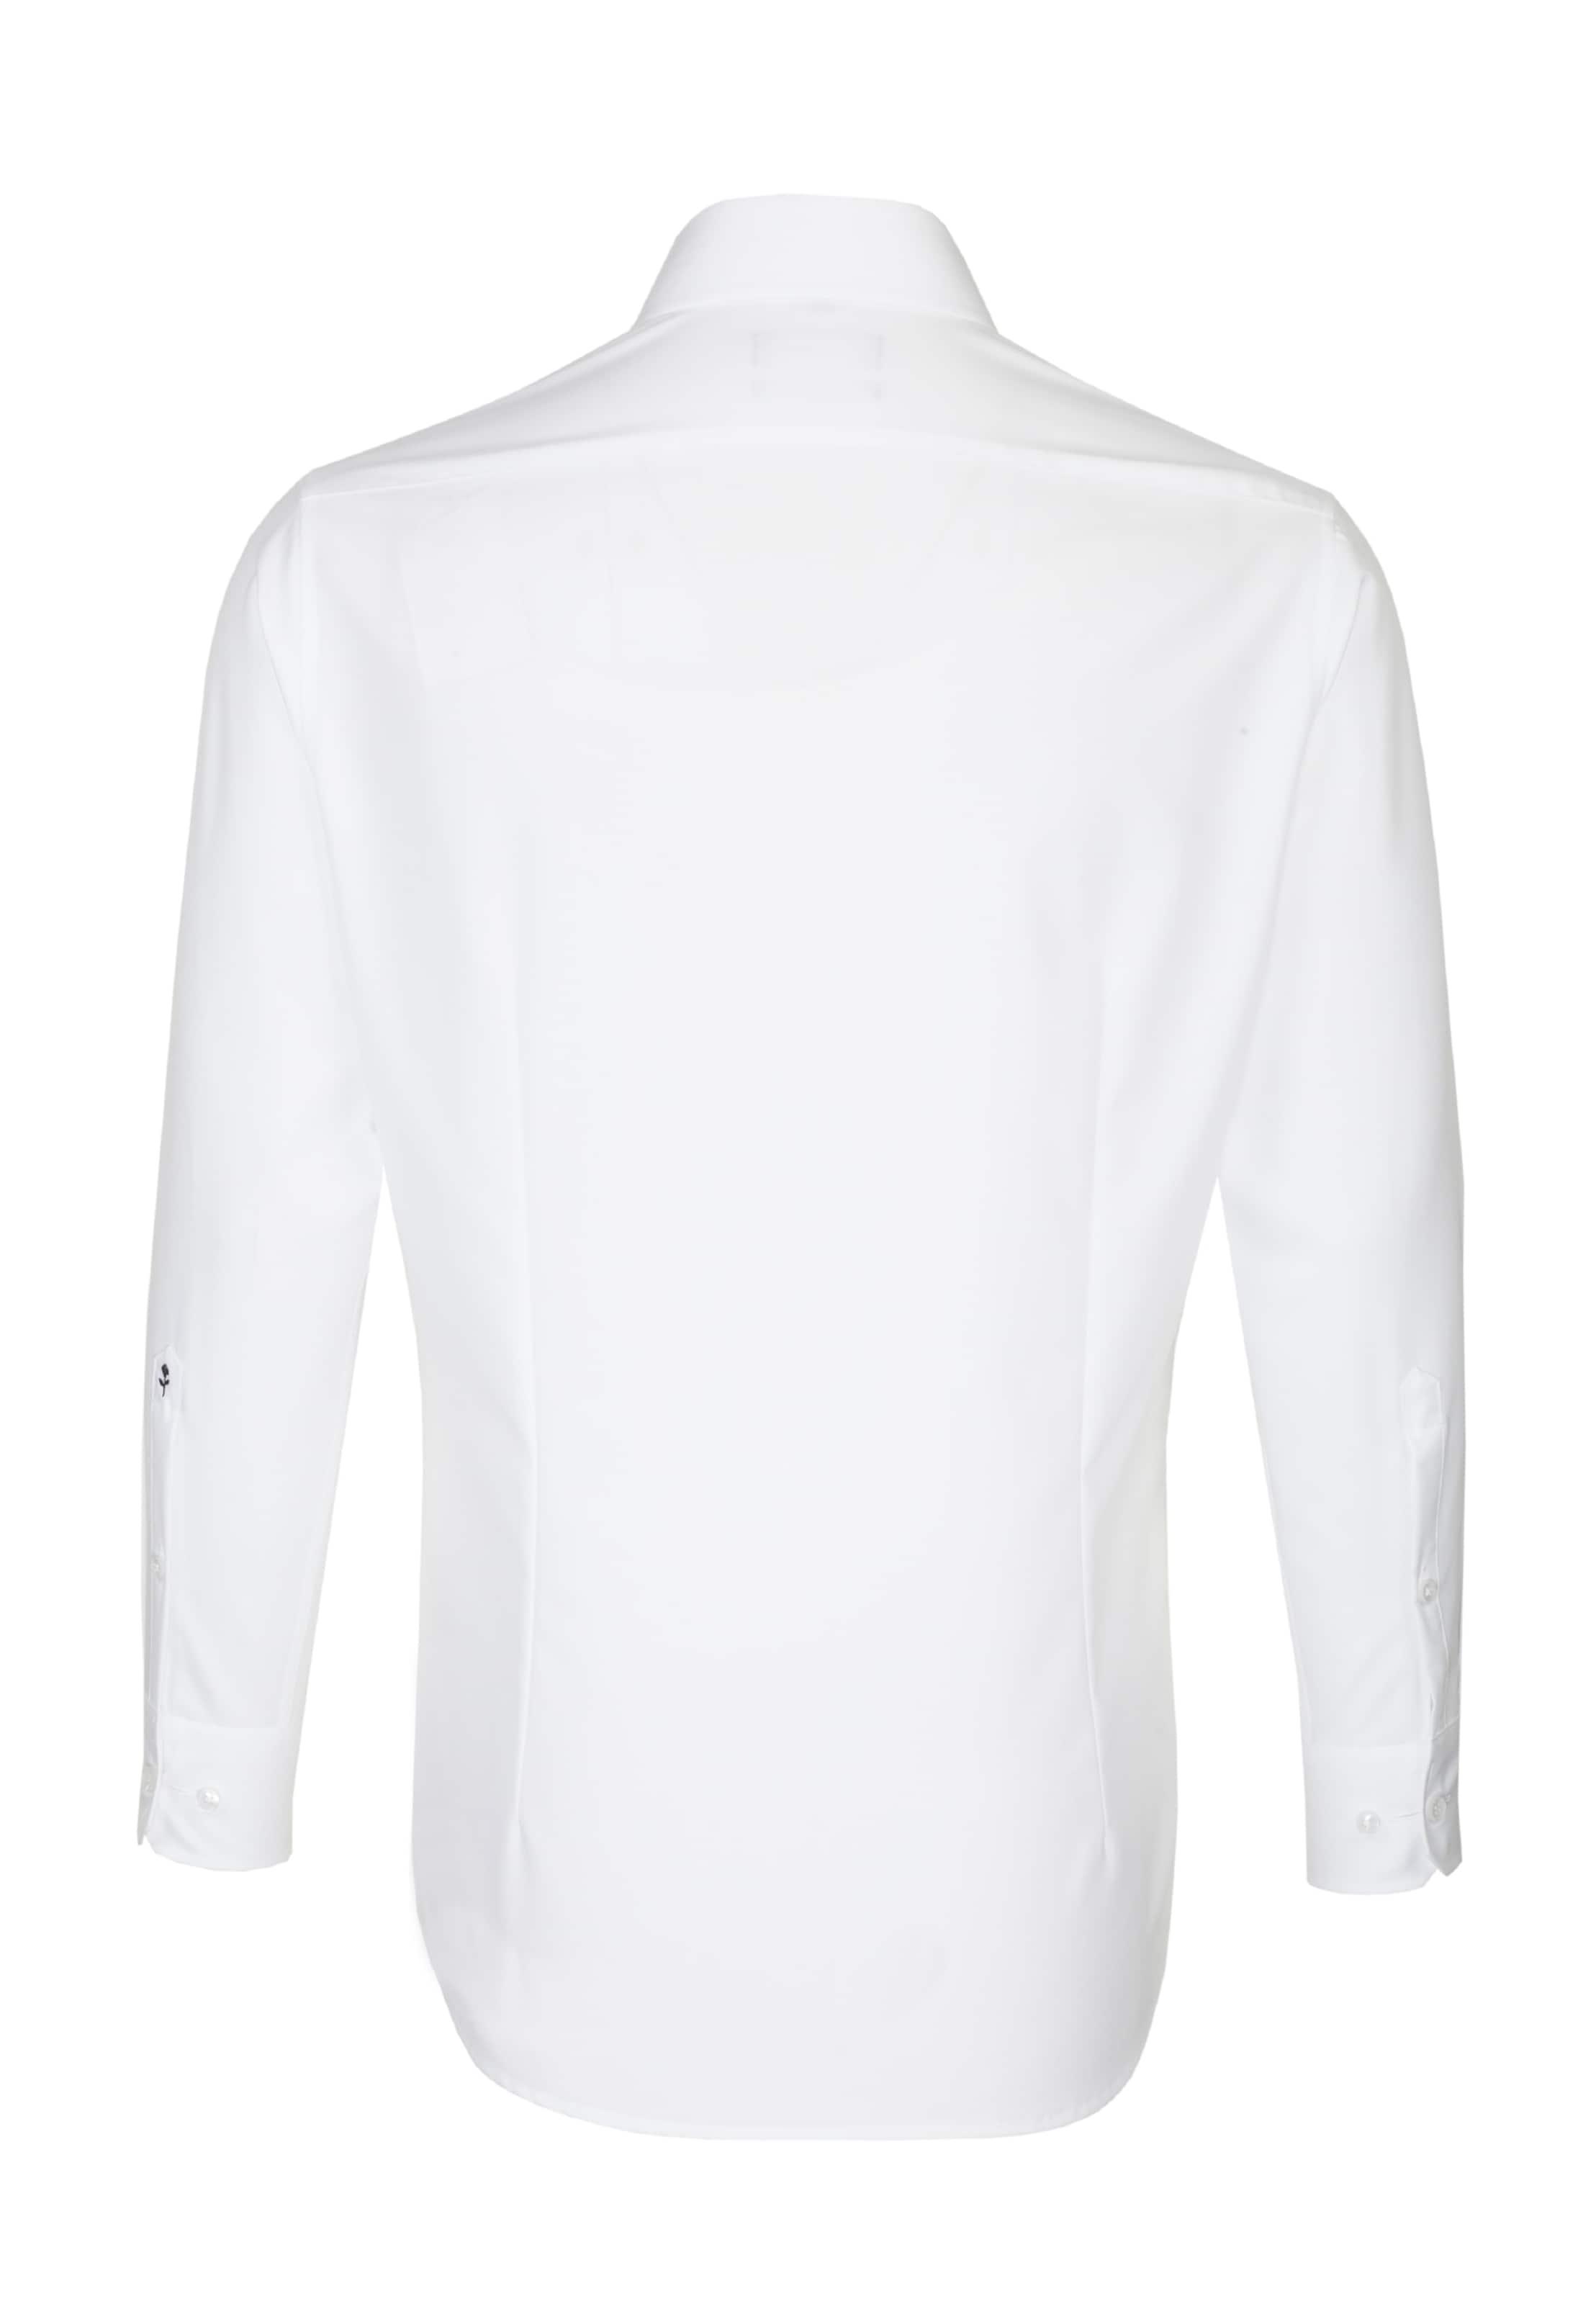 Rabatt-Spielraum Store Billig 2018 Unisex SEIDENSTICKER Business Hemd ' Tailored ' RJjNM7Jz